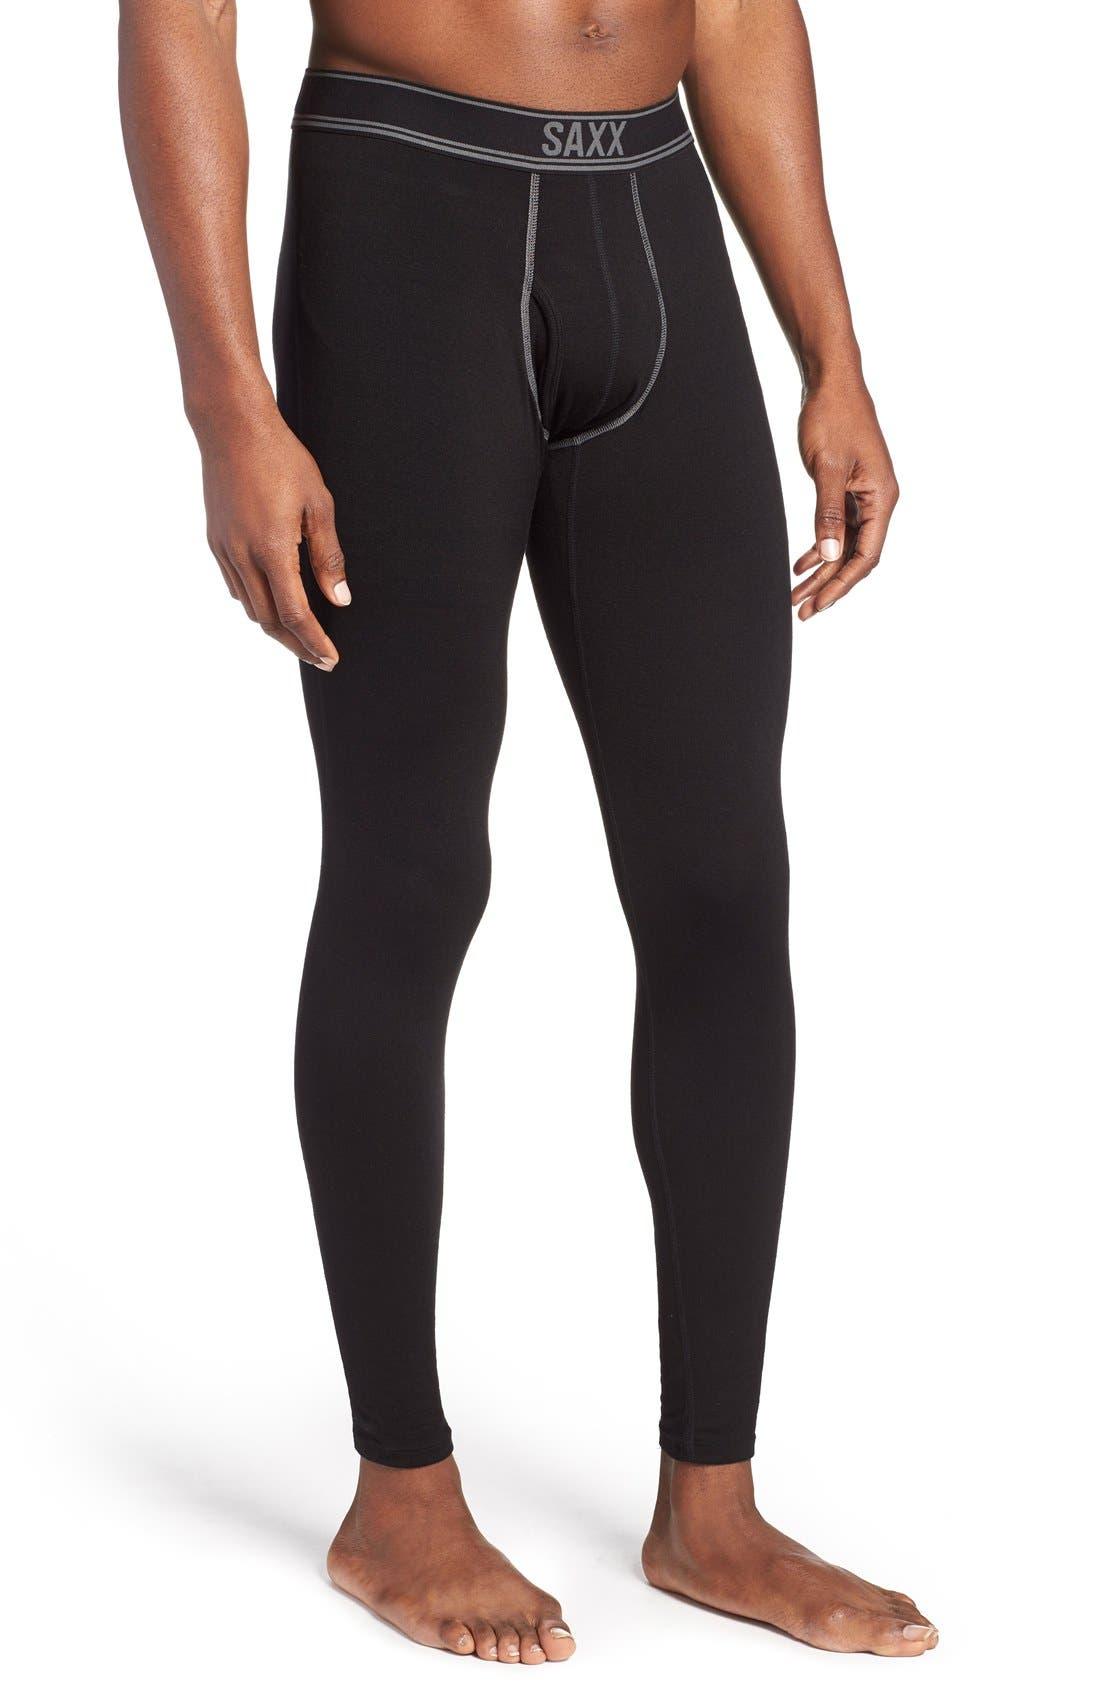 SAXX 'Black Sheep' Moisture Wicking Long Underwear, Main, color, 019